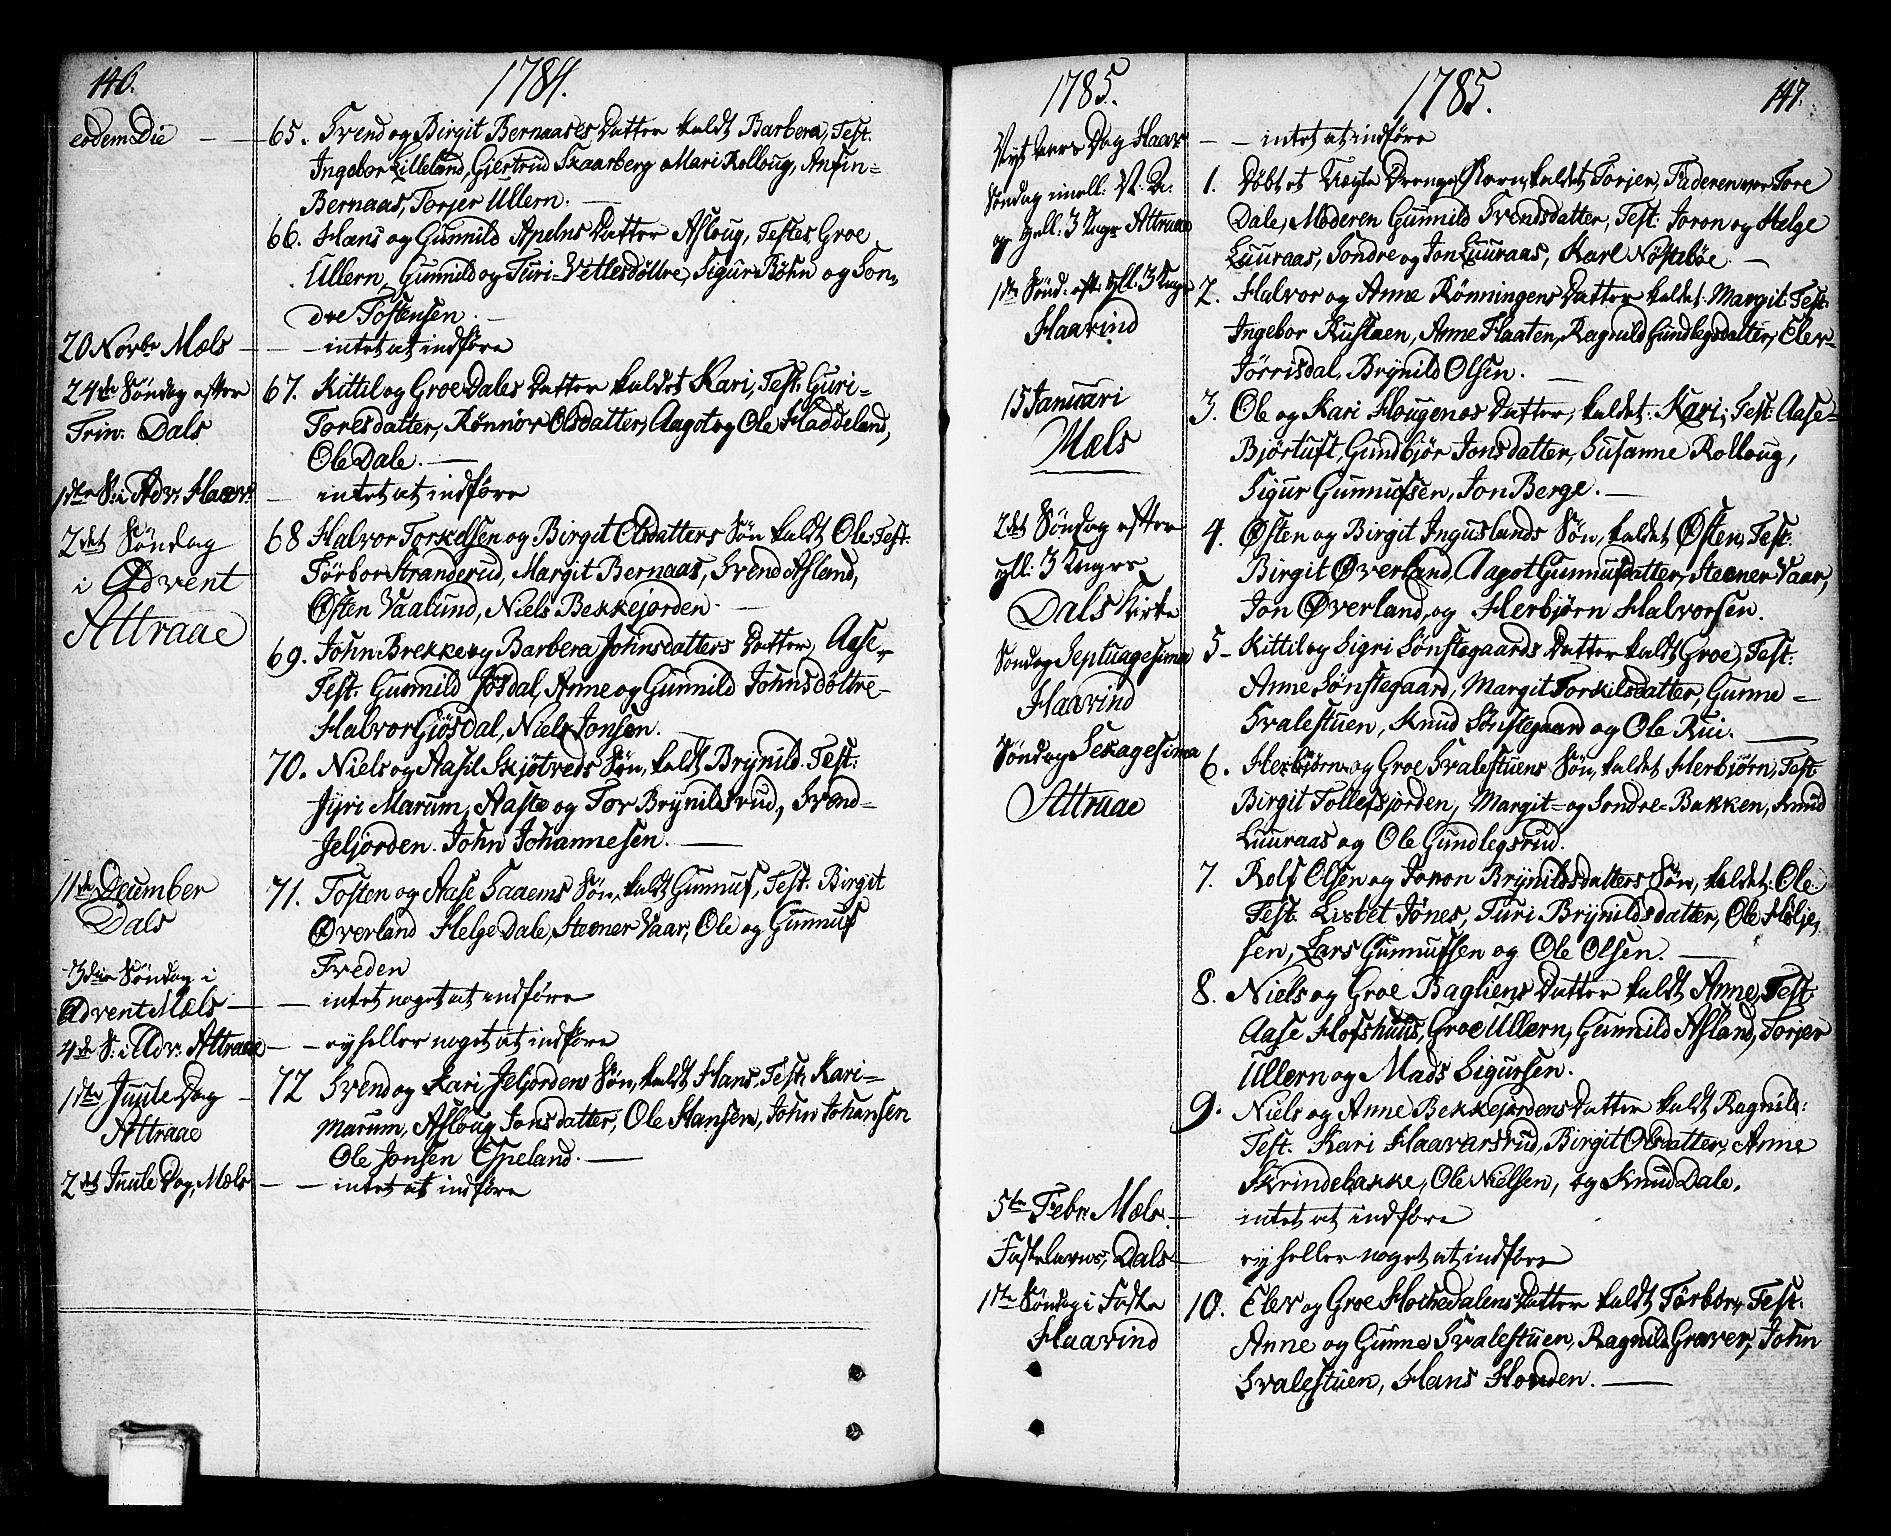 SAKO, Tinn kirkebøker, F/Fa/L0002: Ministerialbok nr. I 2, 1757-1810, s. 146-147